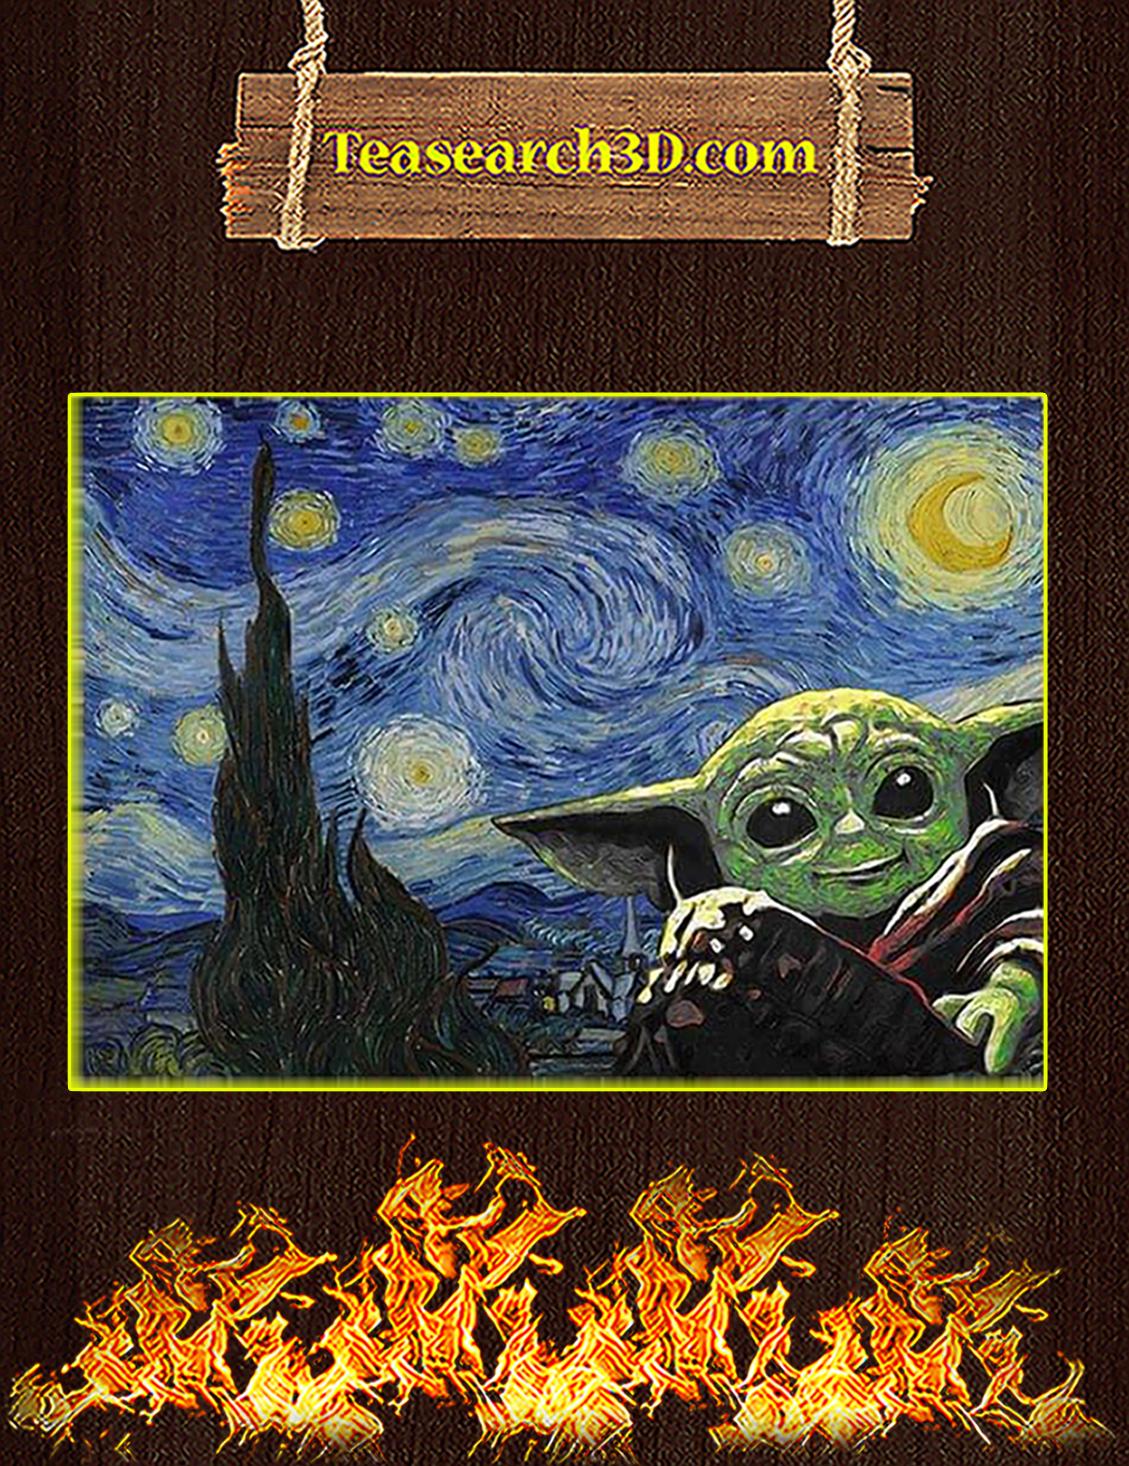 Baby yoda starry night van gogh poster A3